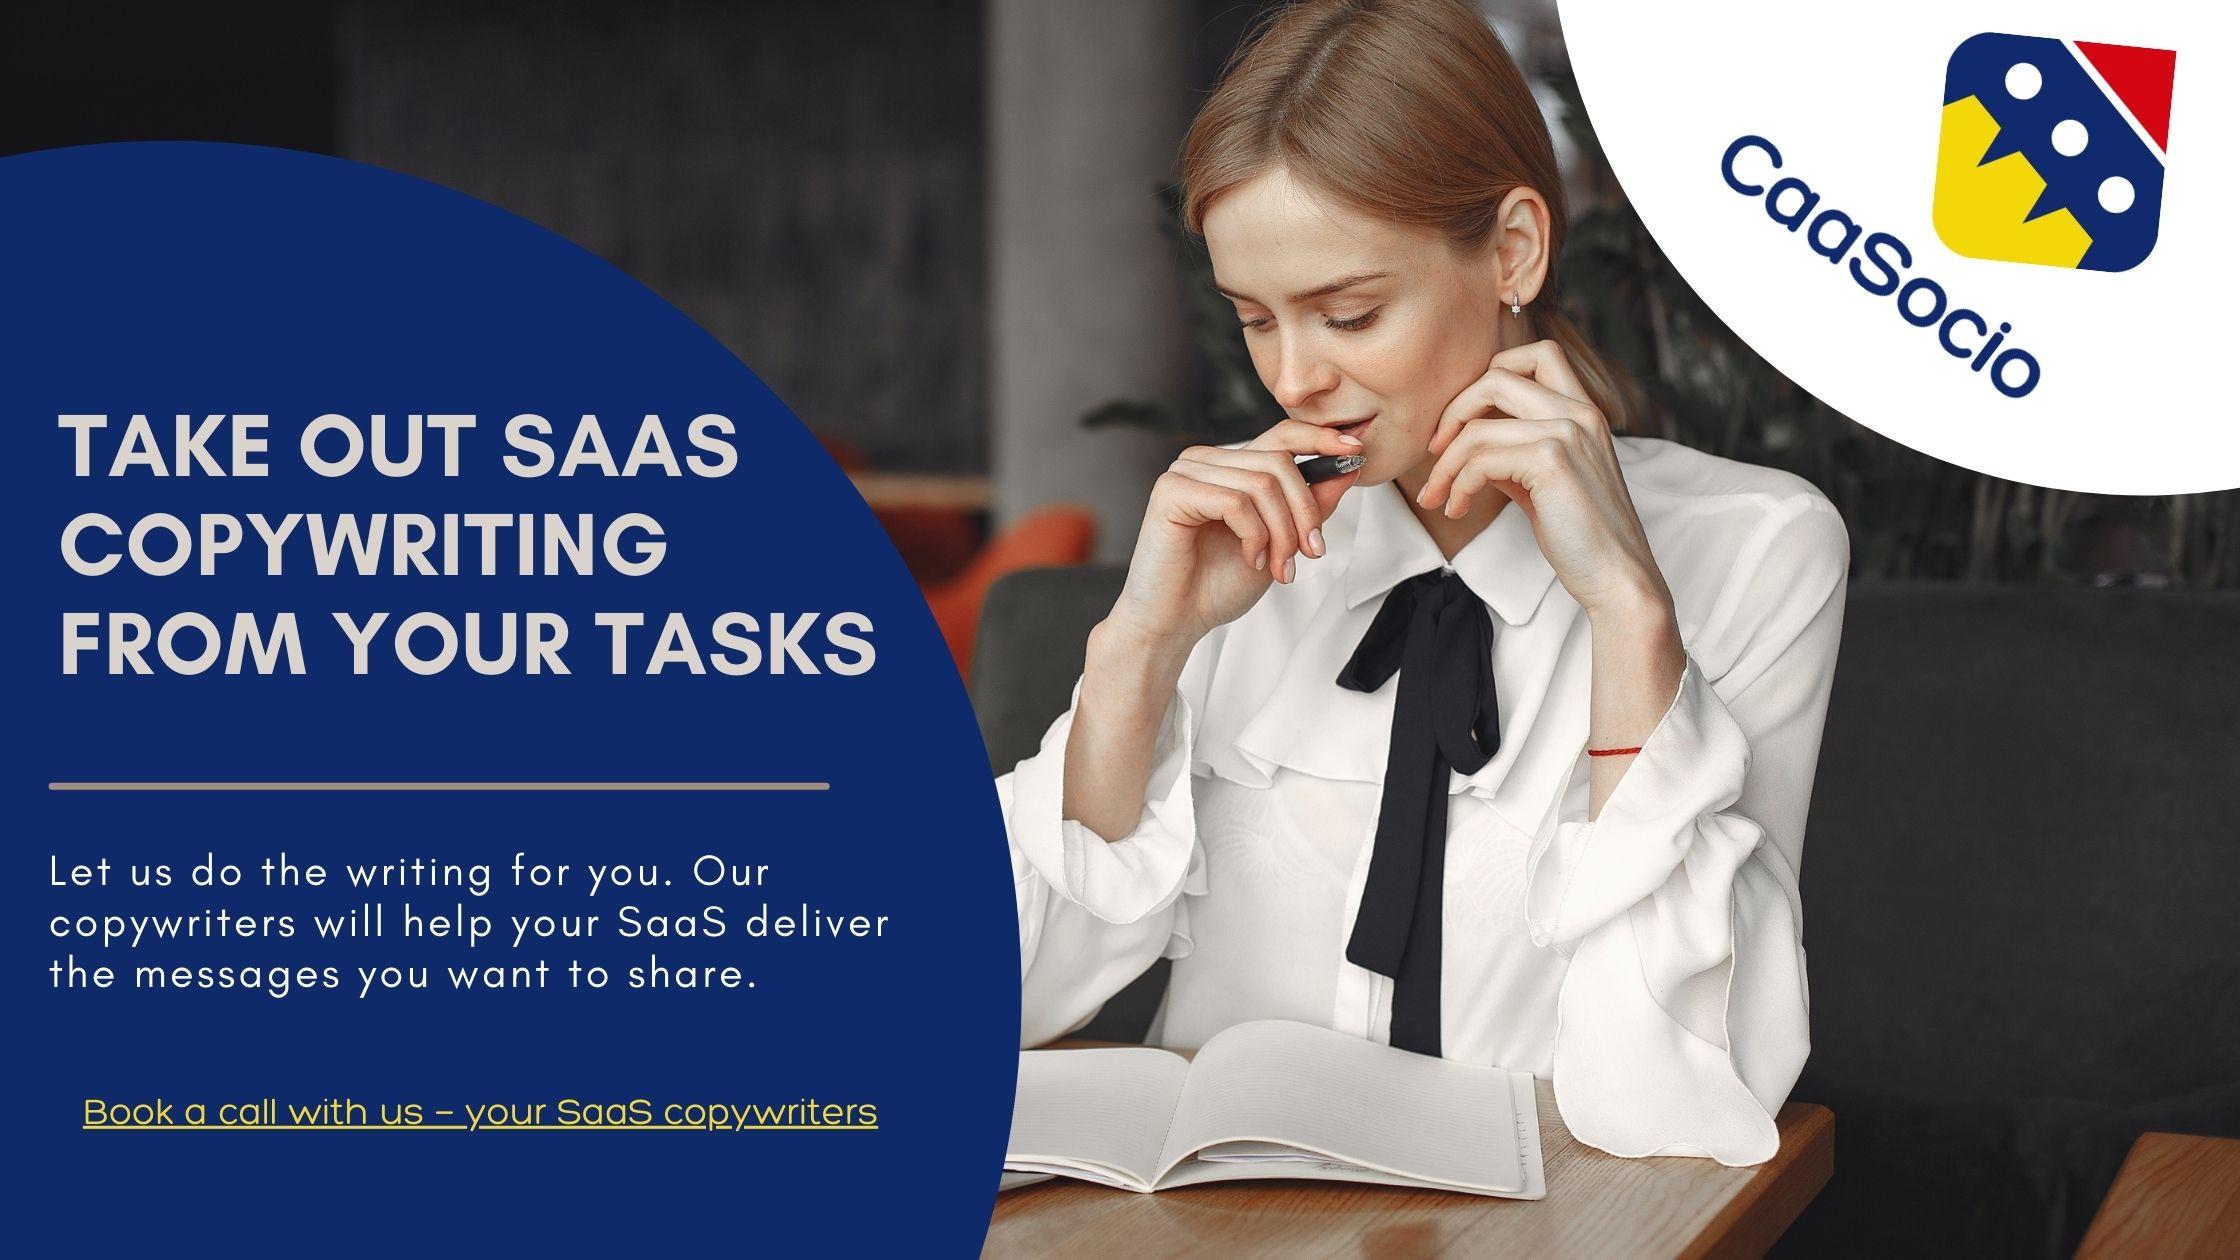 CaaSocio-BlogCTA-copywriting-tips-for-saas